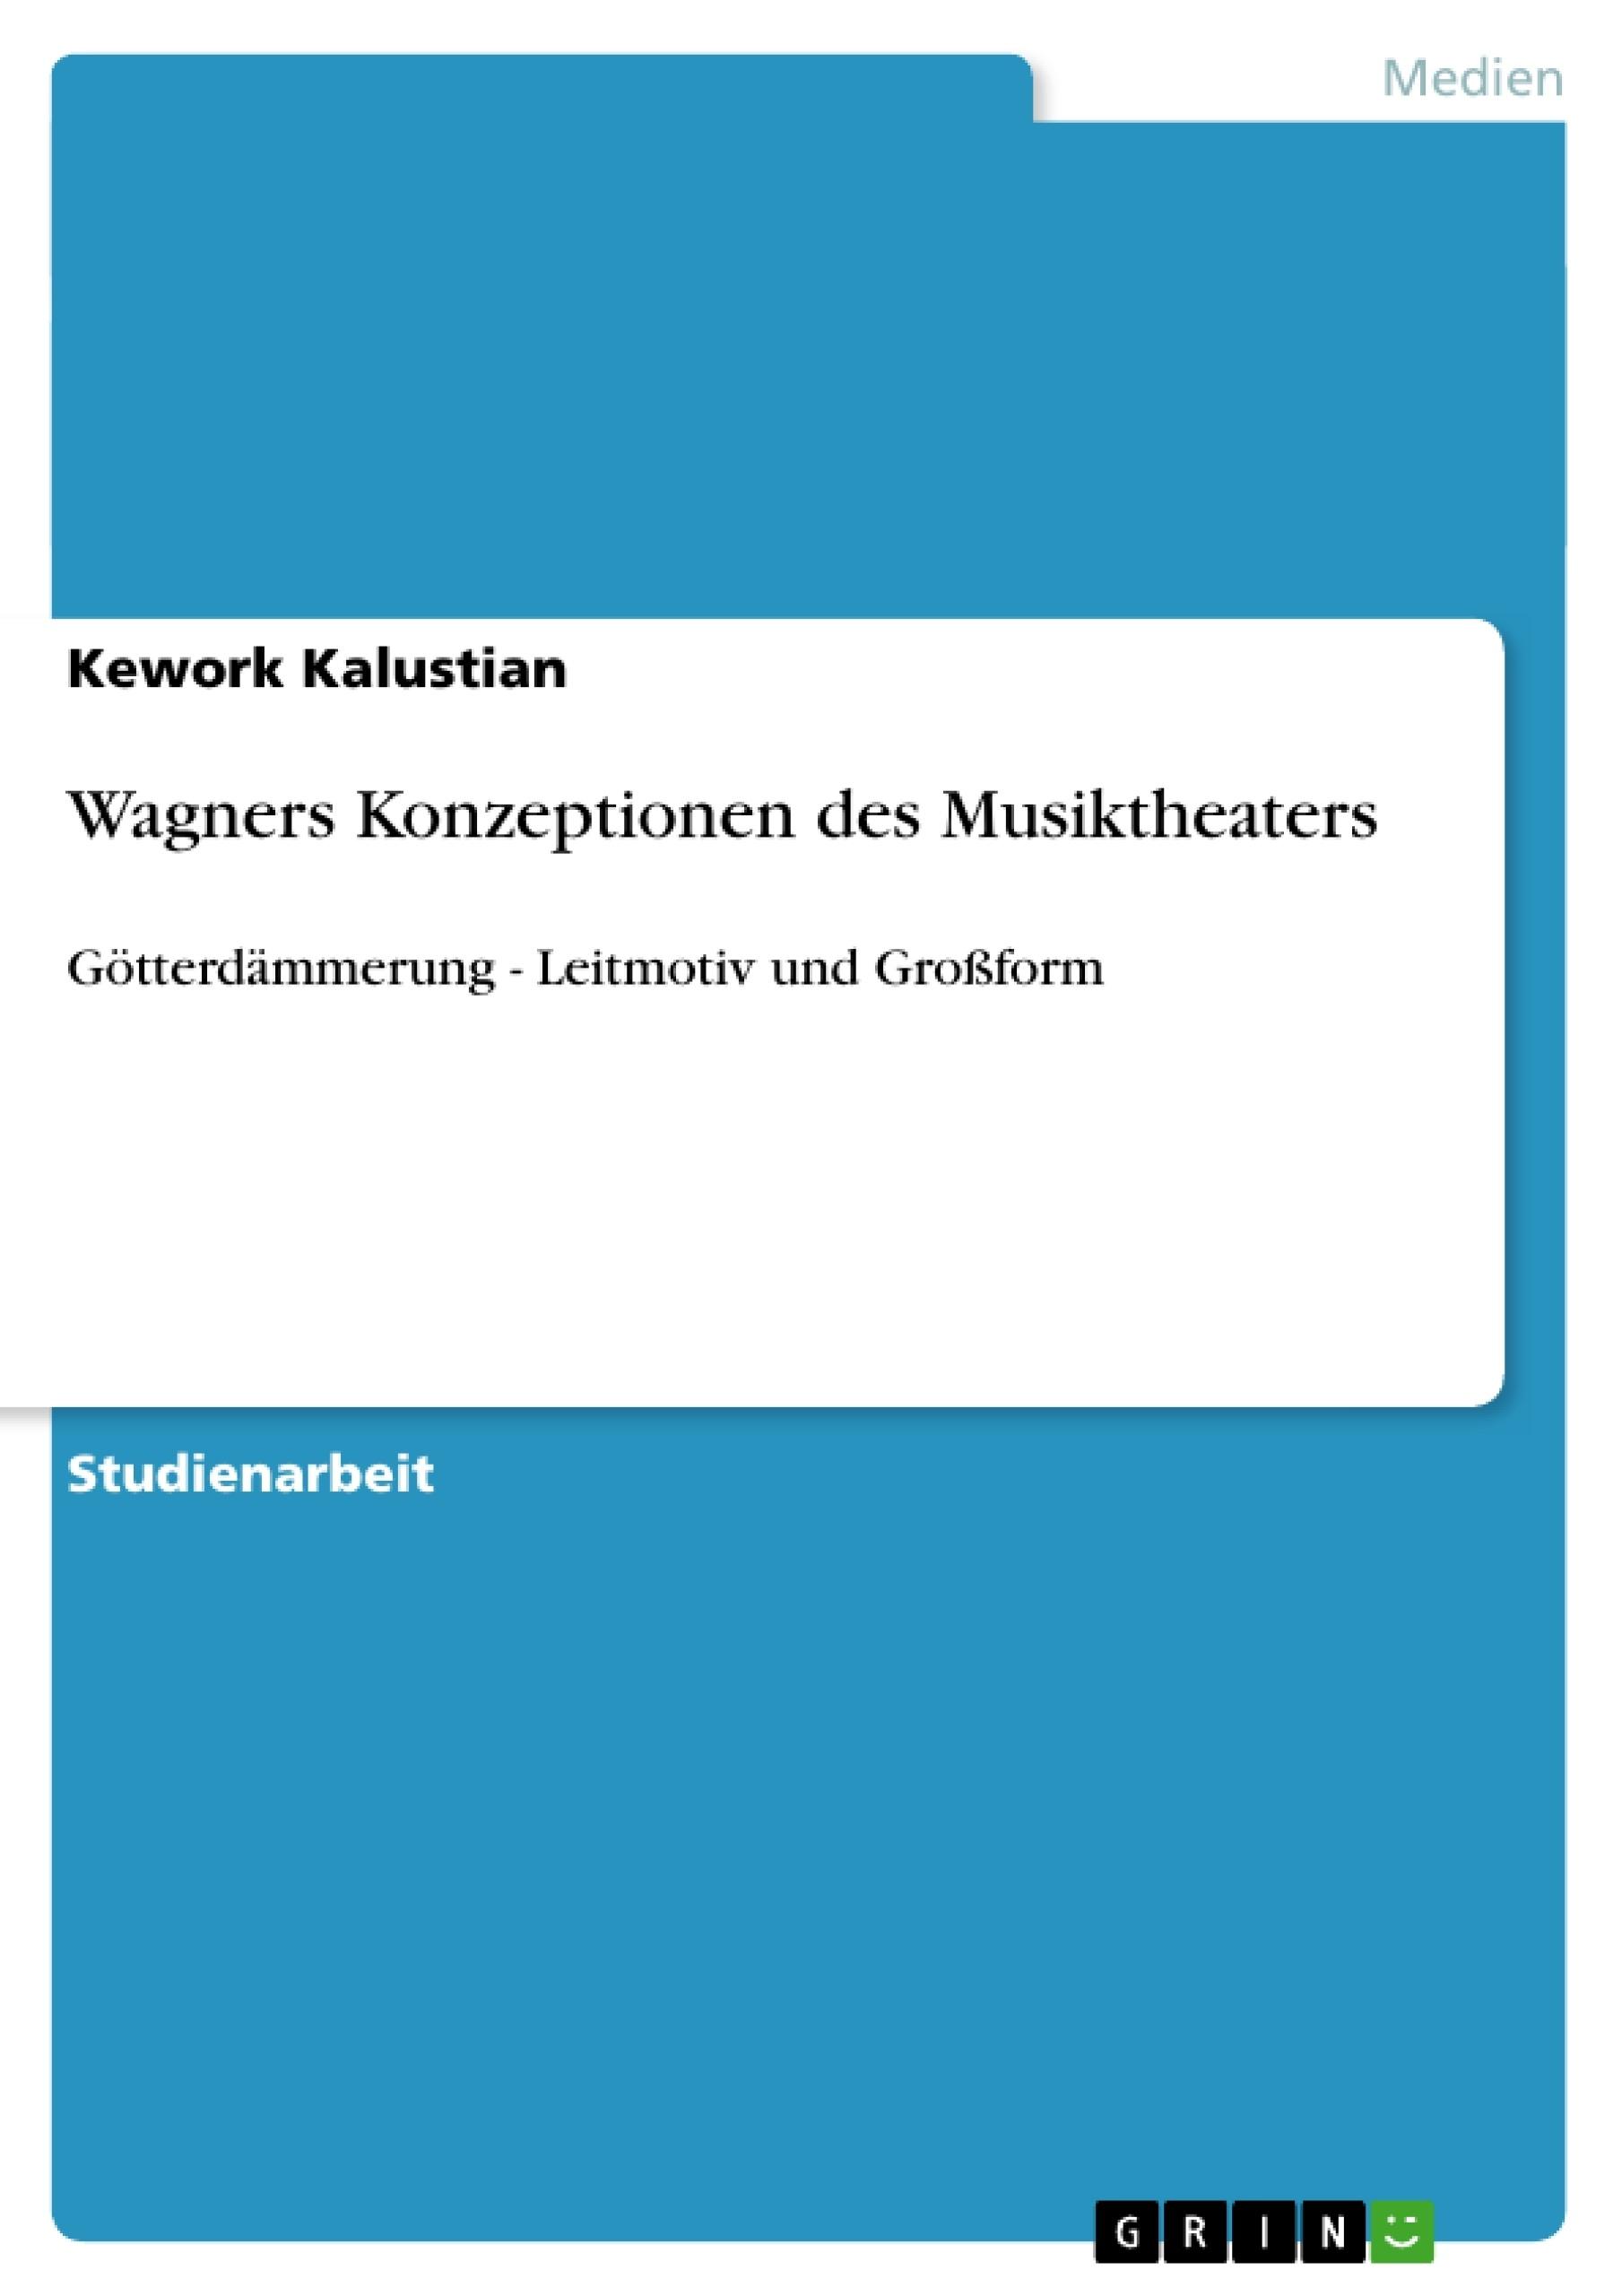 Titel: Wagners Konzeptionen des Musiktheaters